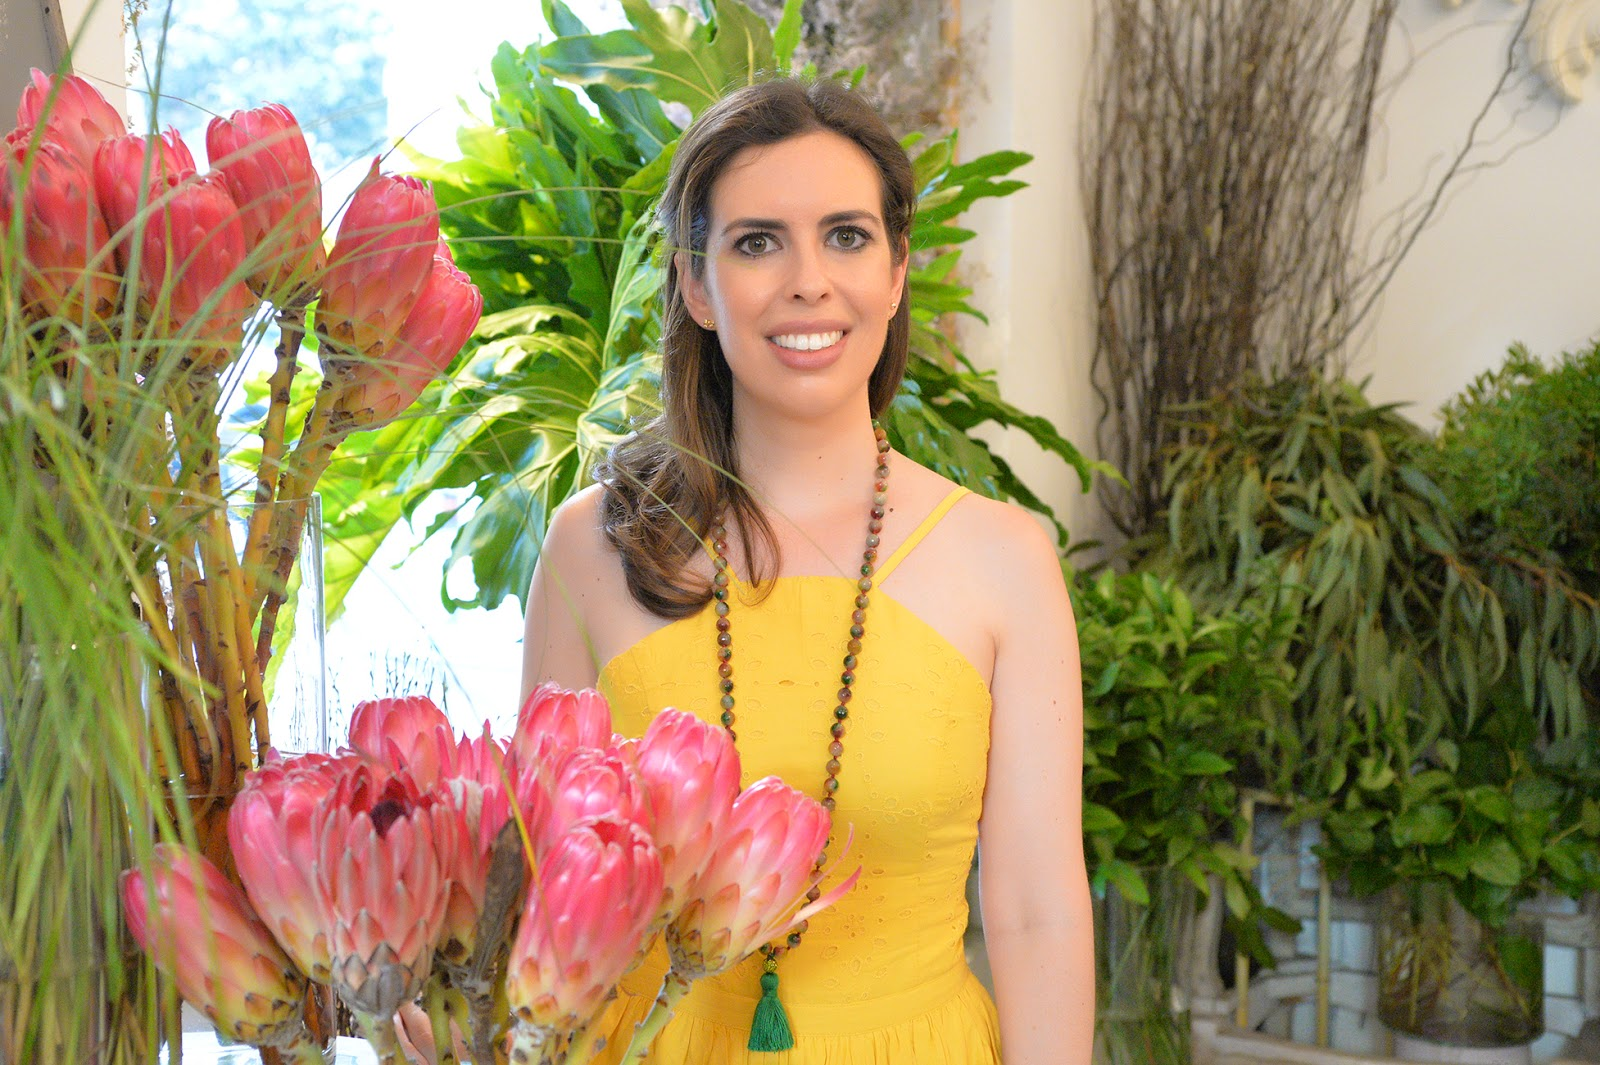 margarita se llama mi amor flower shop floristeria madrid